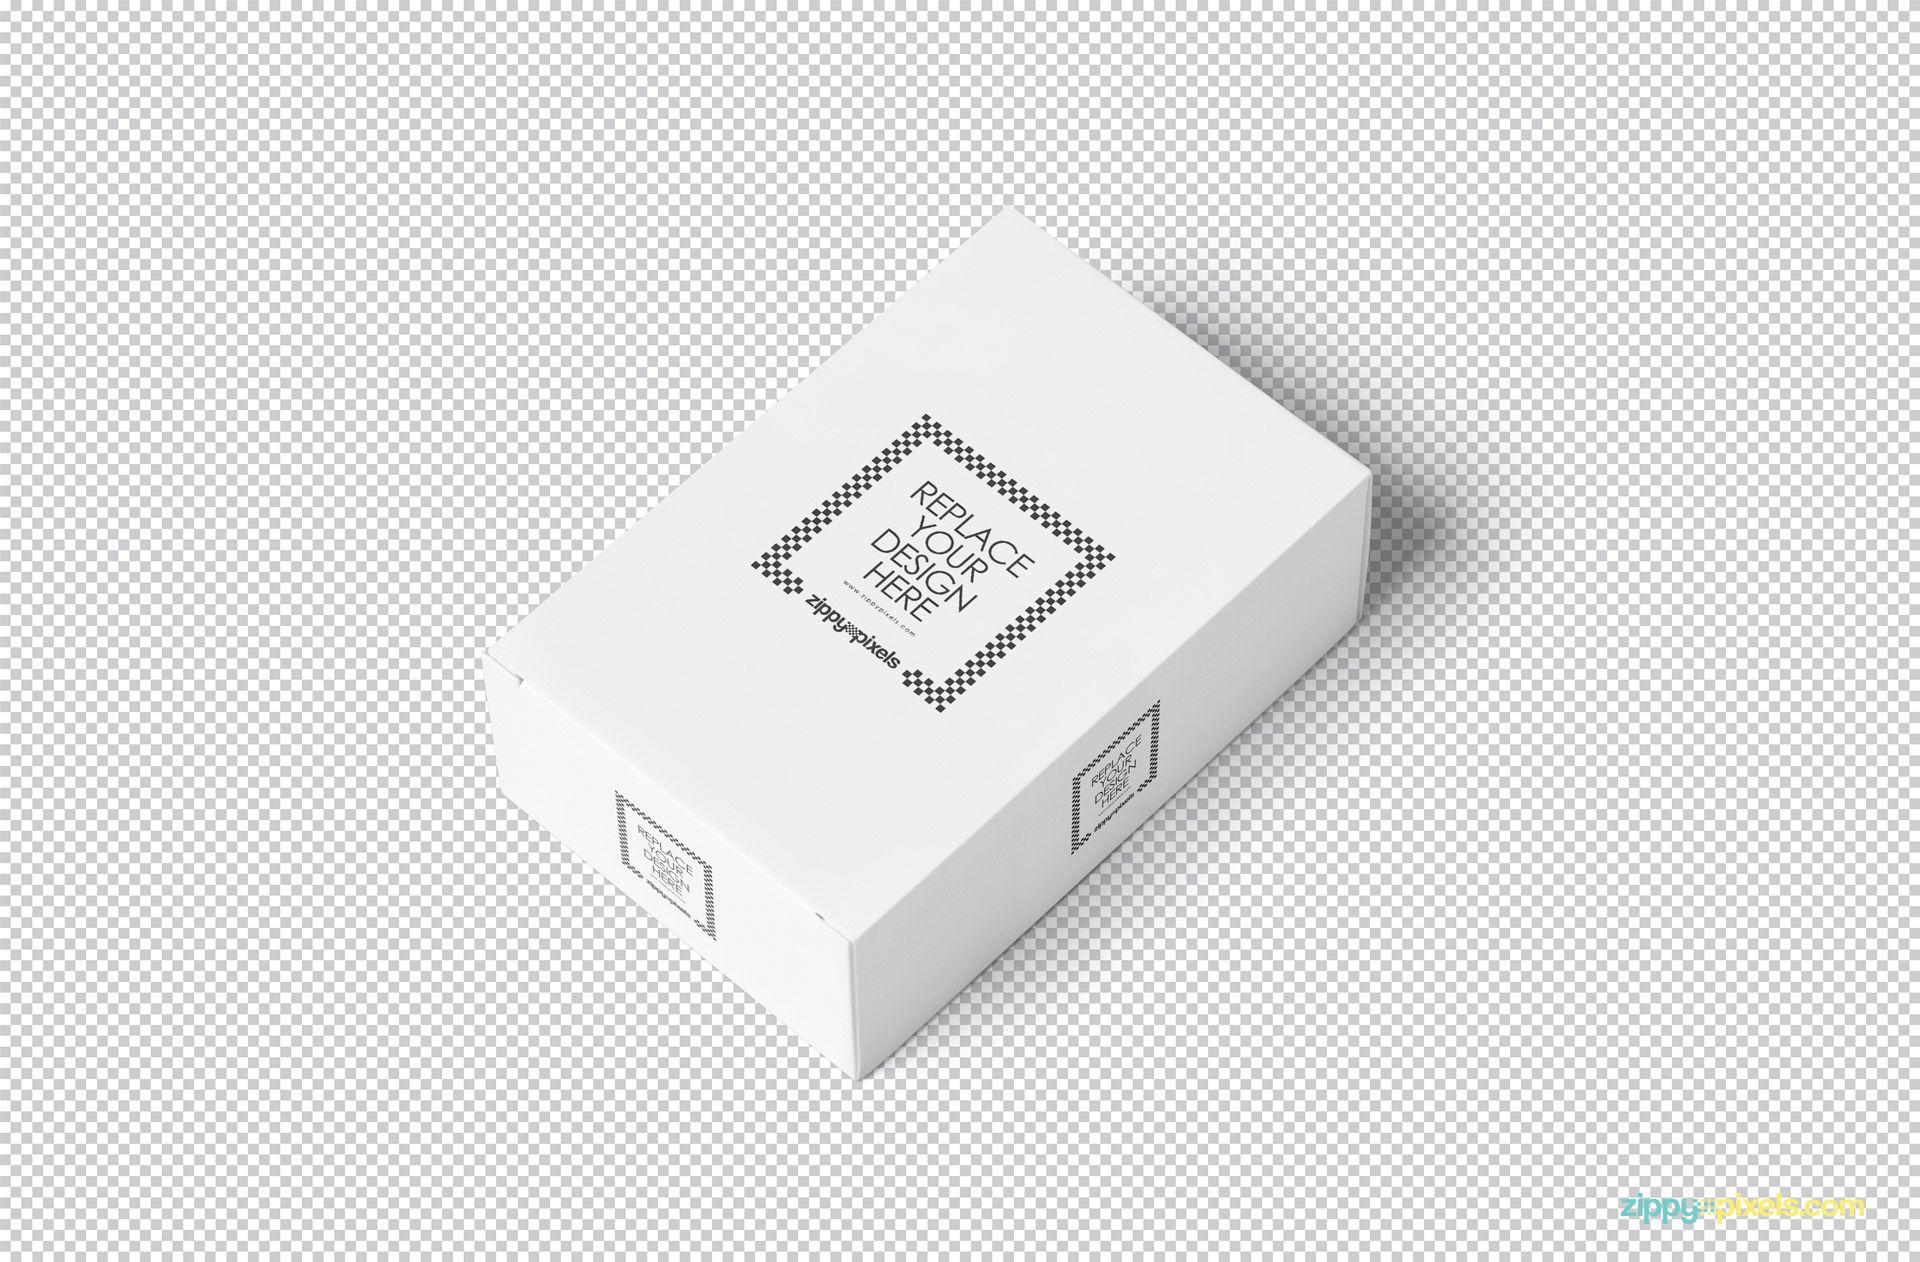 Download Free Customizable Card Box Mockup Zippypixels Box Mockup Card Box Box Packaging Design